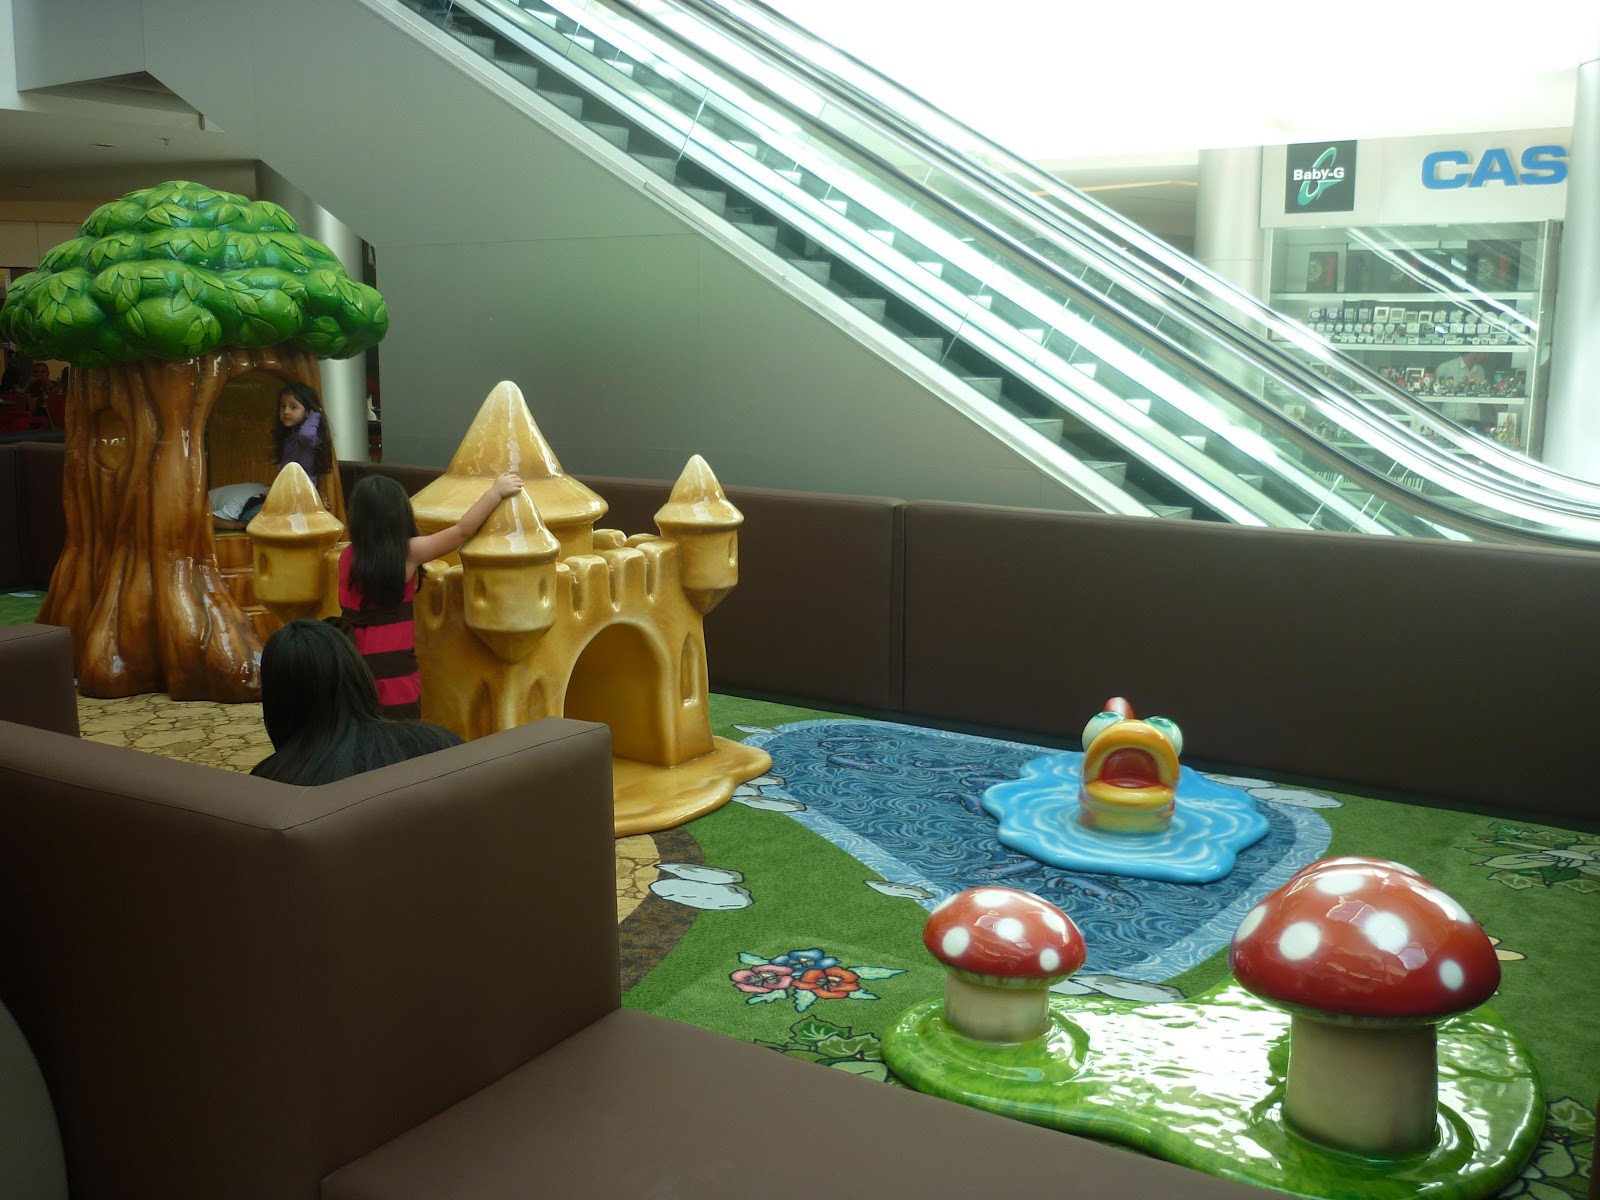 Ihram Kids For Sale Dubai: Tuff Stuff: Shopping Center Tuff